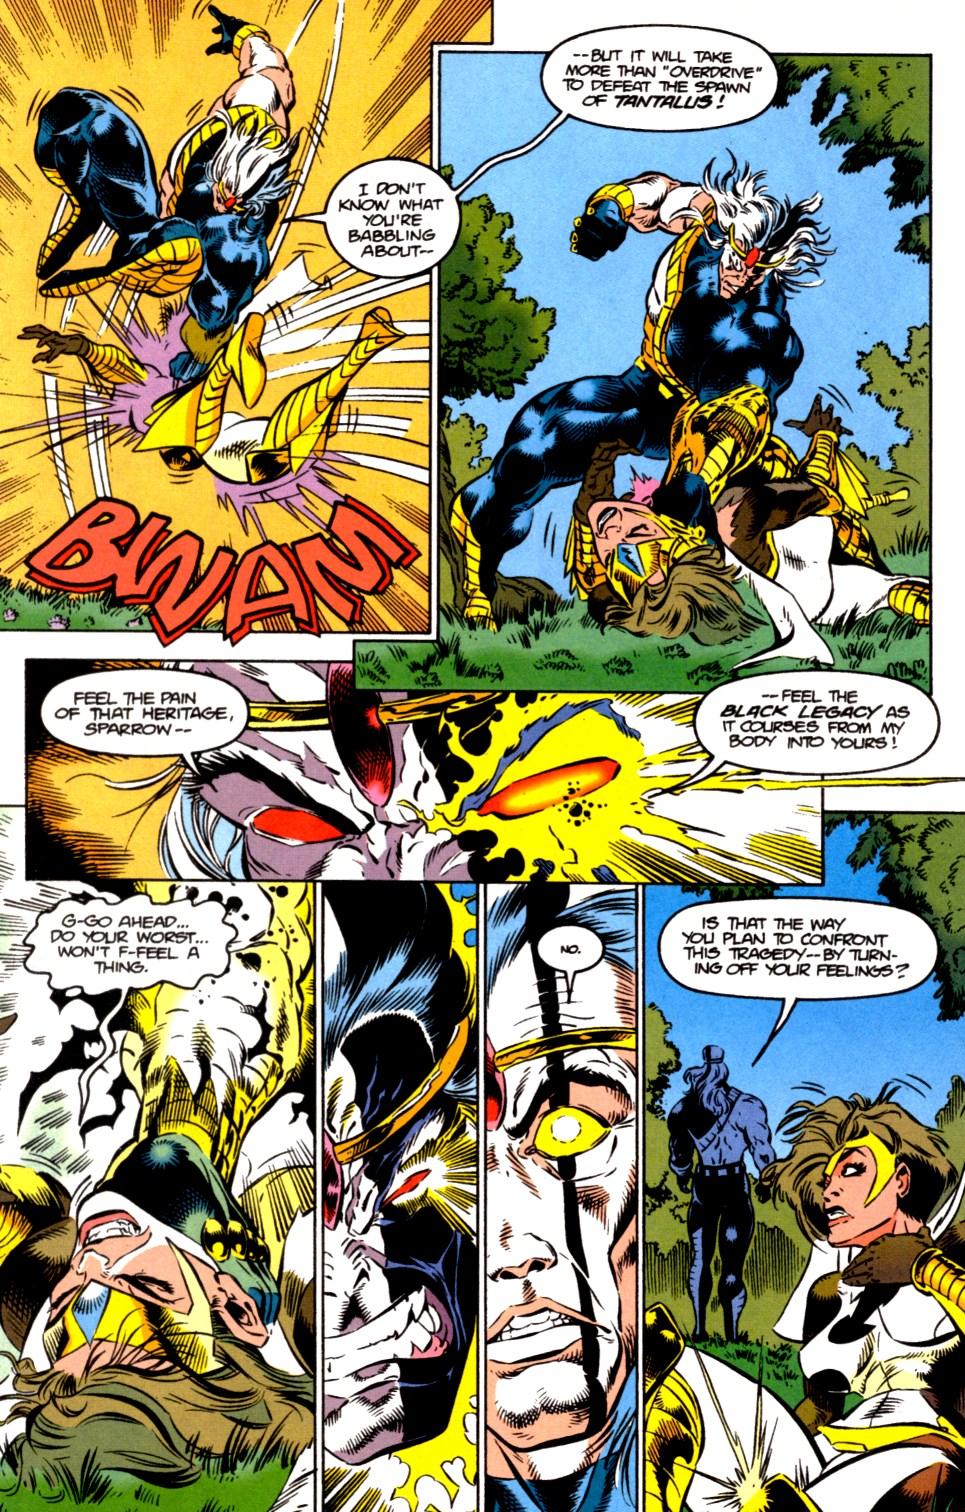 Read online Blackwulf comic -  Issue #6 - 10